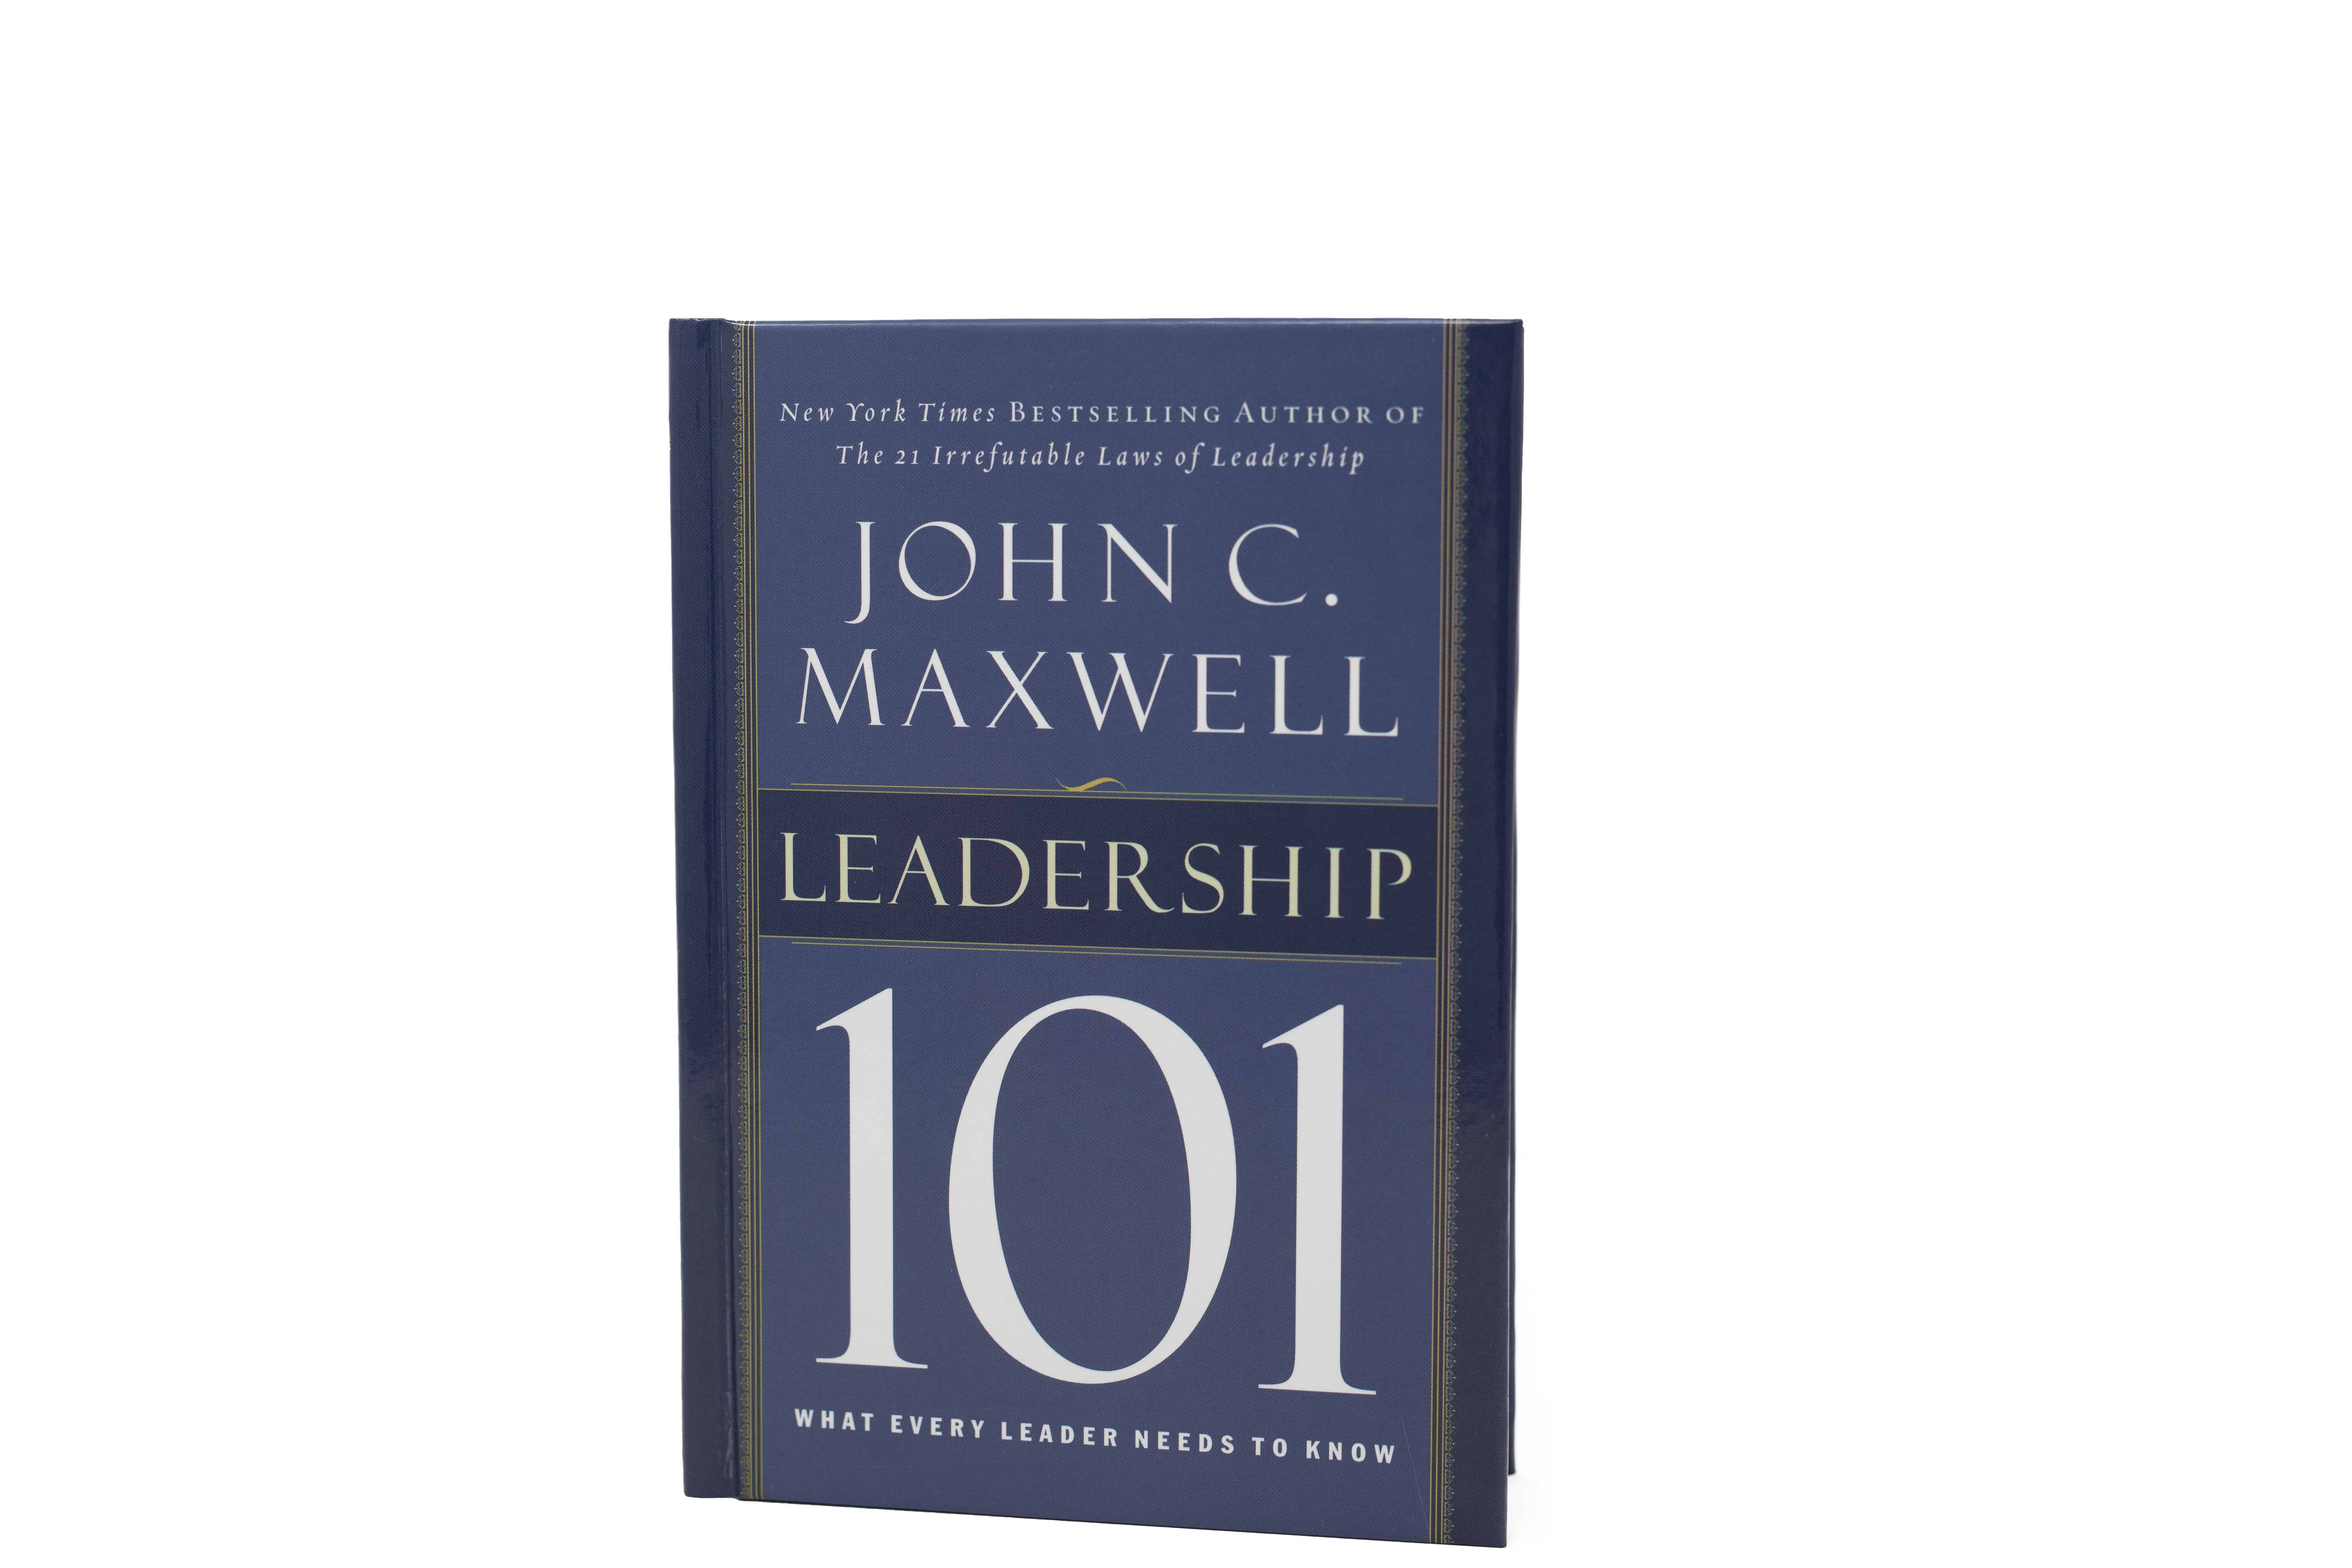 Leadership 101 Hardcover Bk2200